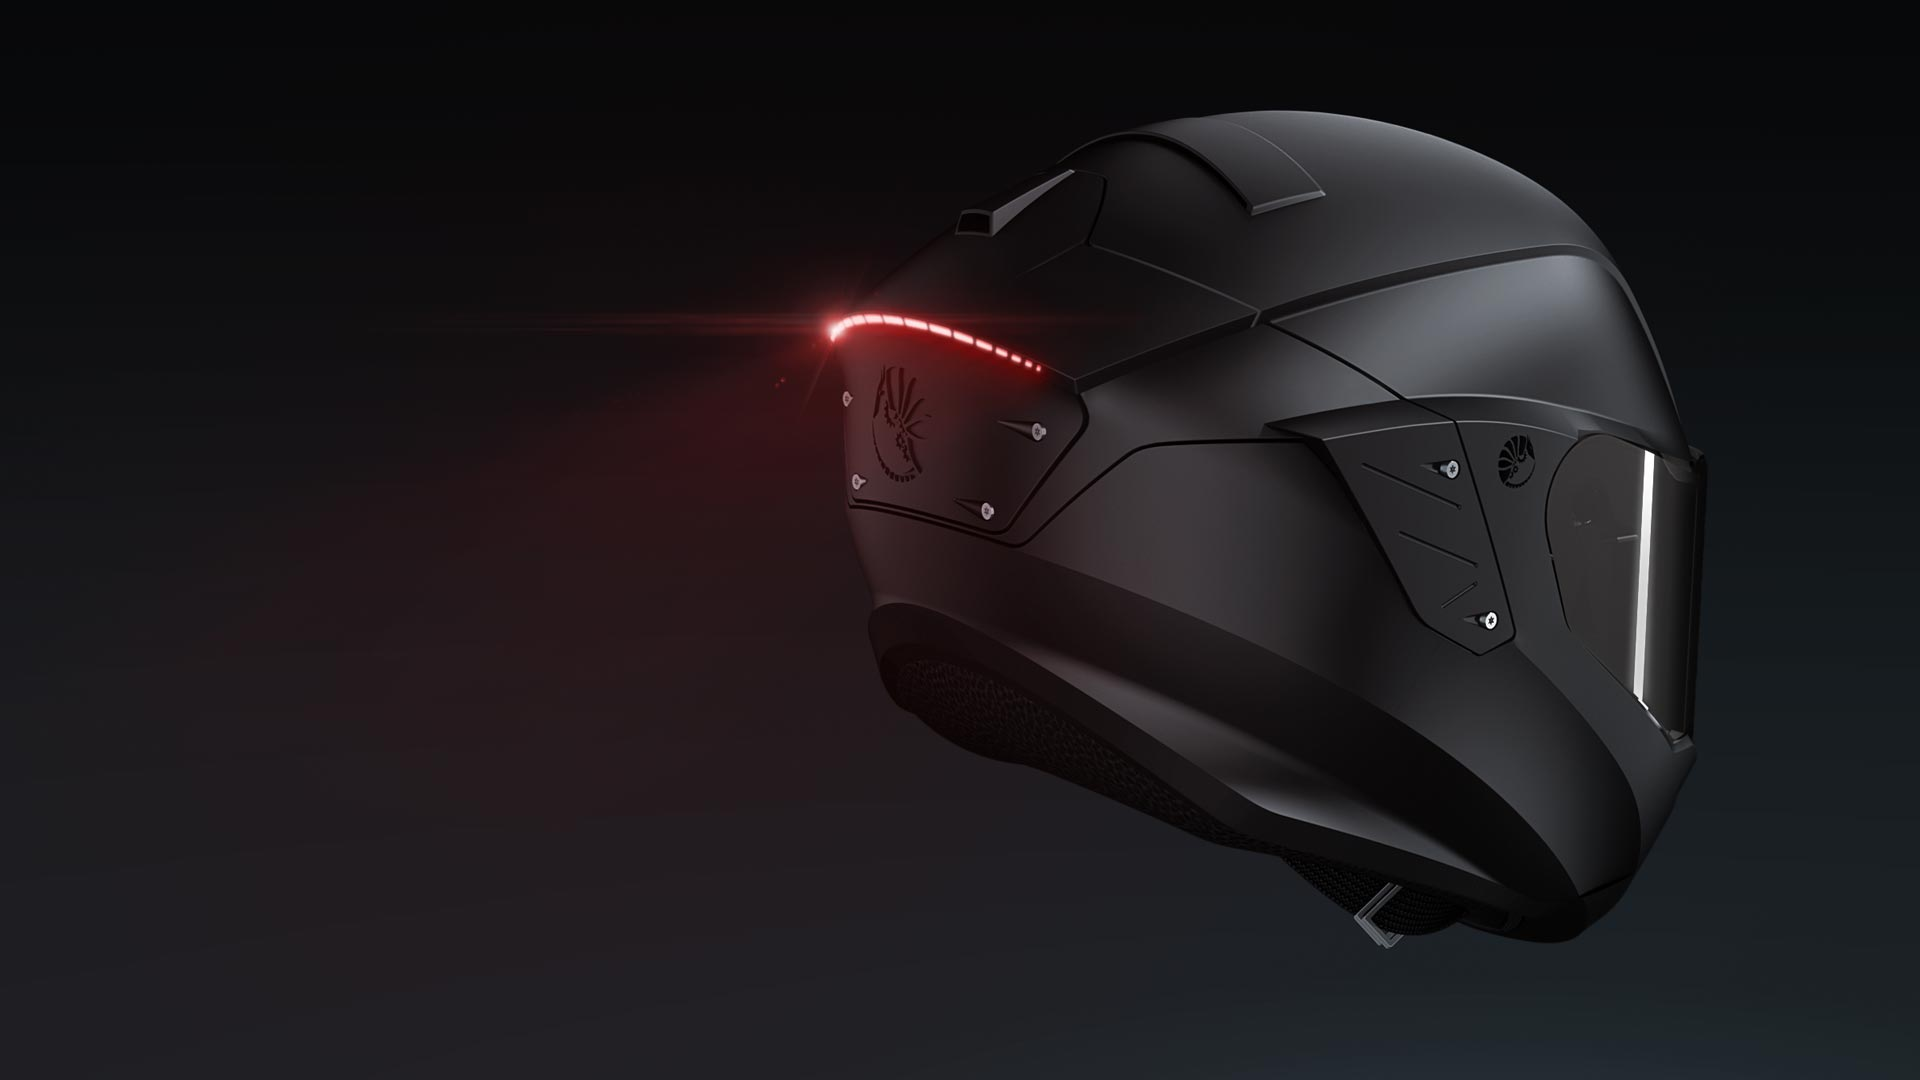 Motorcycle helmet design back light